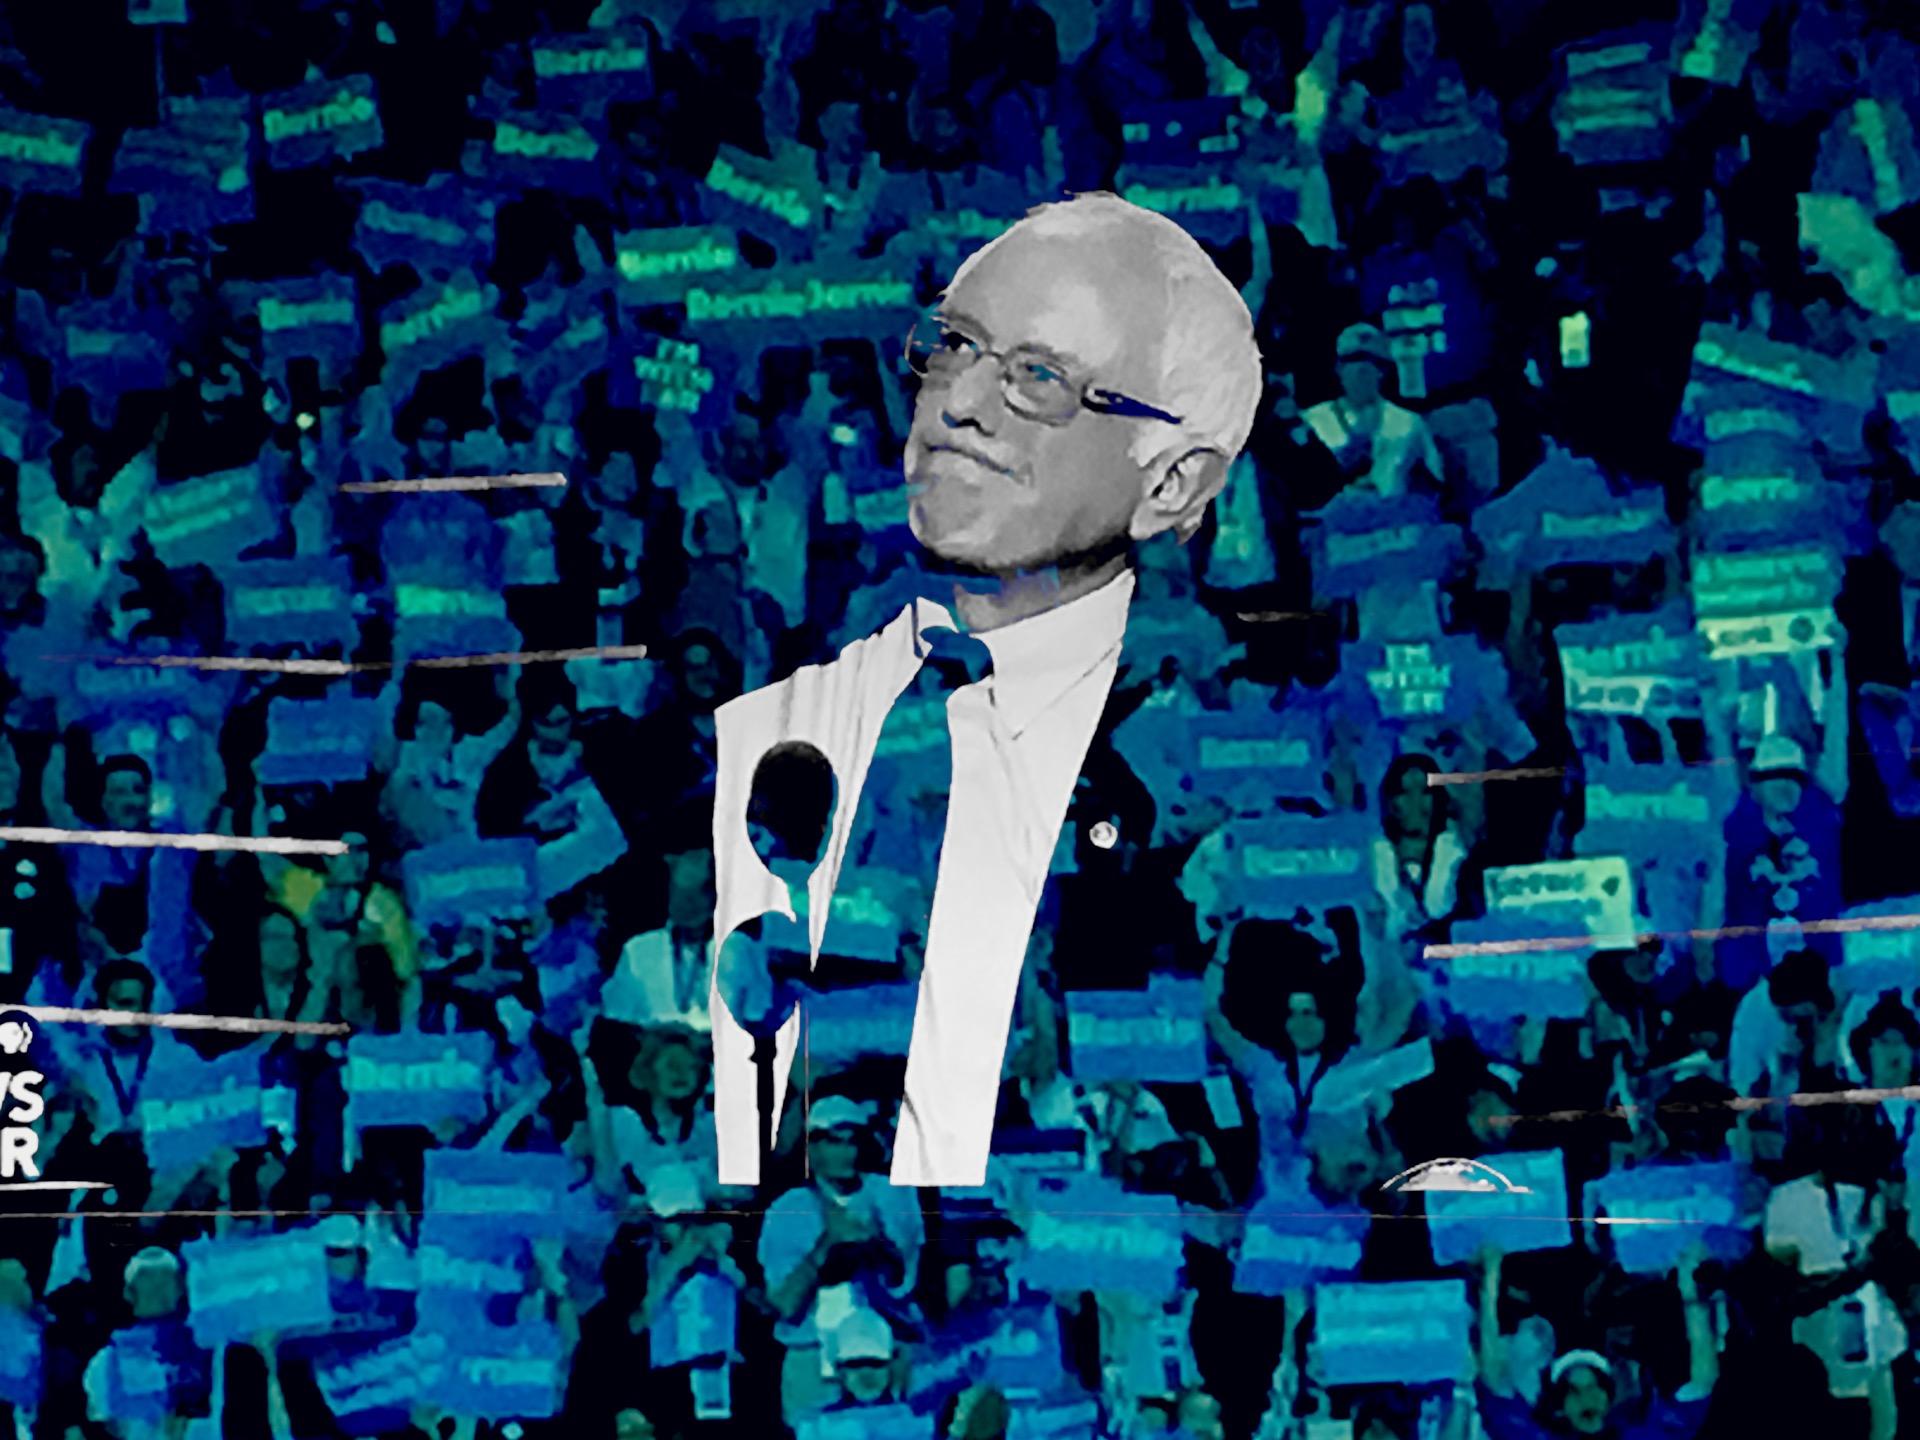 Bernie Sanders addresses the DNC. (Composite image by Biz Herman/GroundTruth)